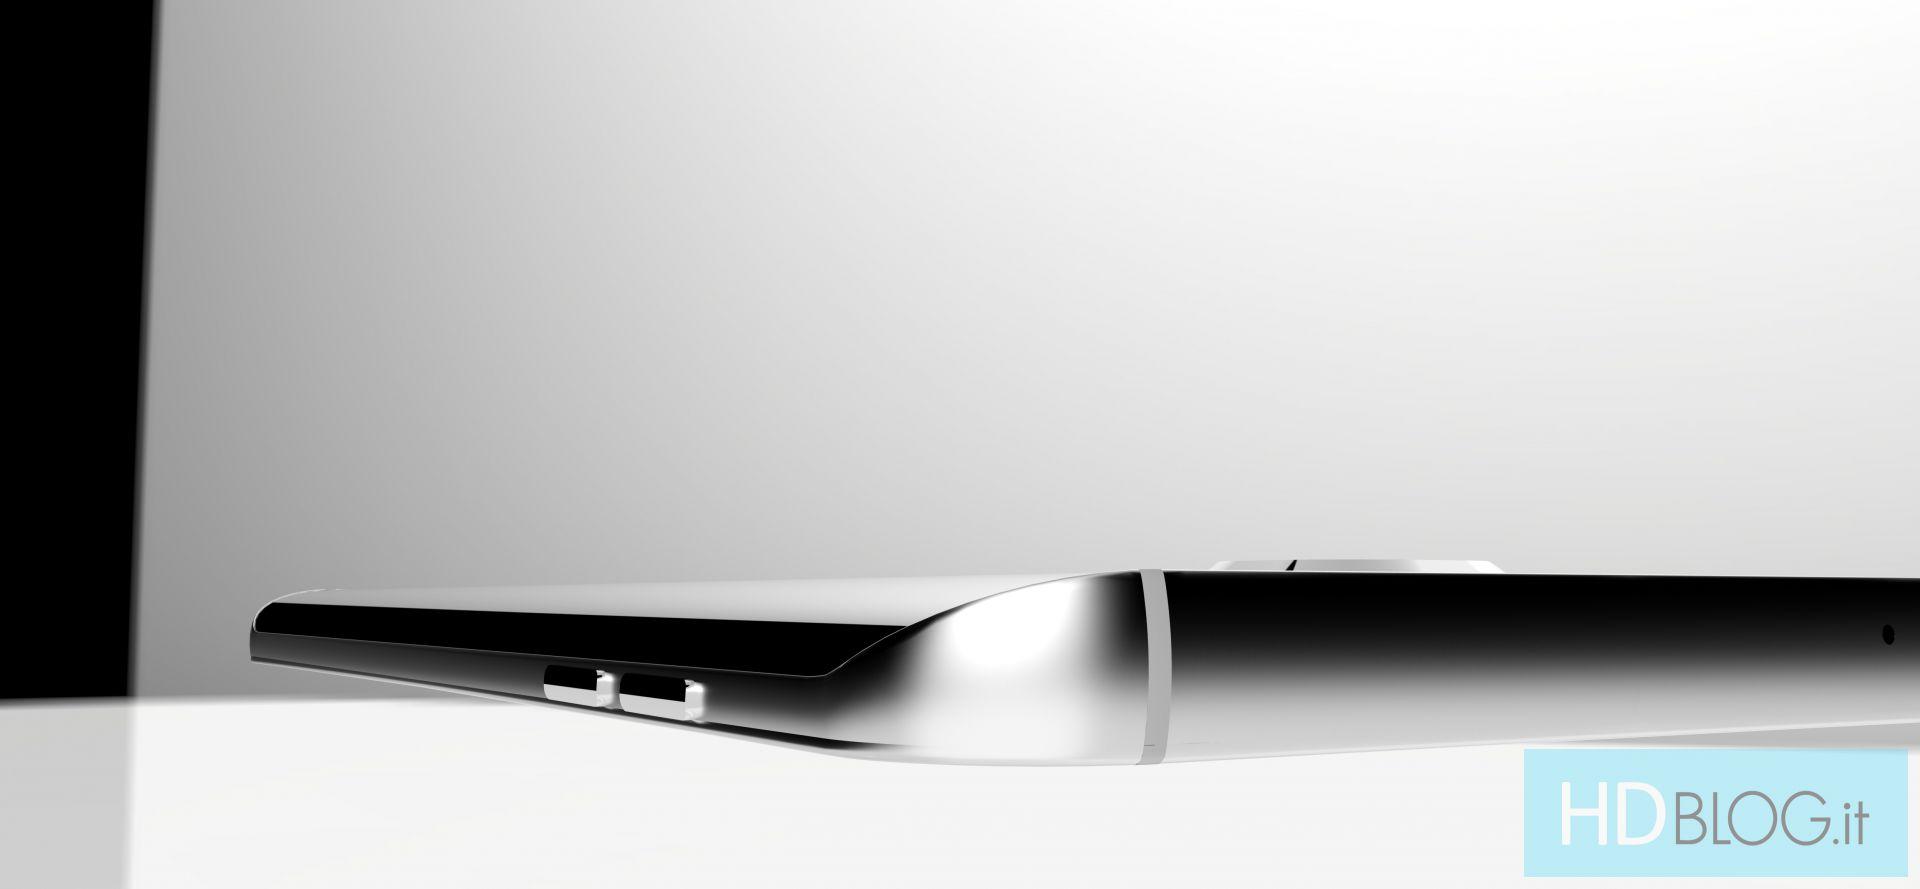 Galaxy-Note-5-schematics-and-concept-renders-15.jpg